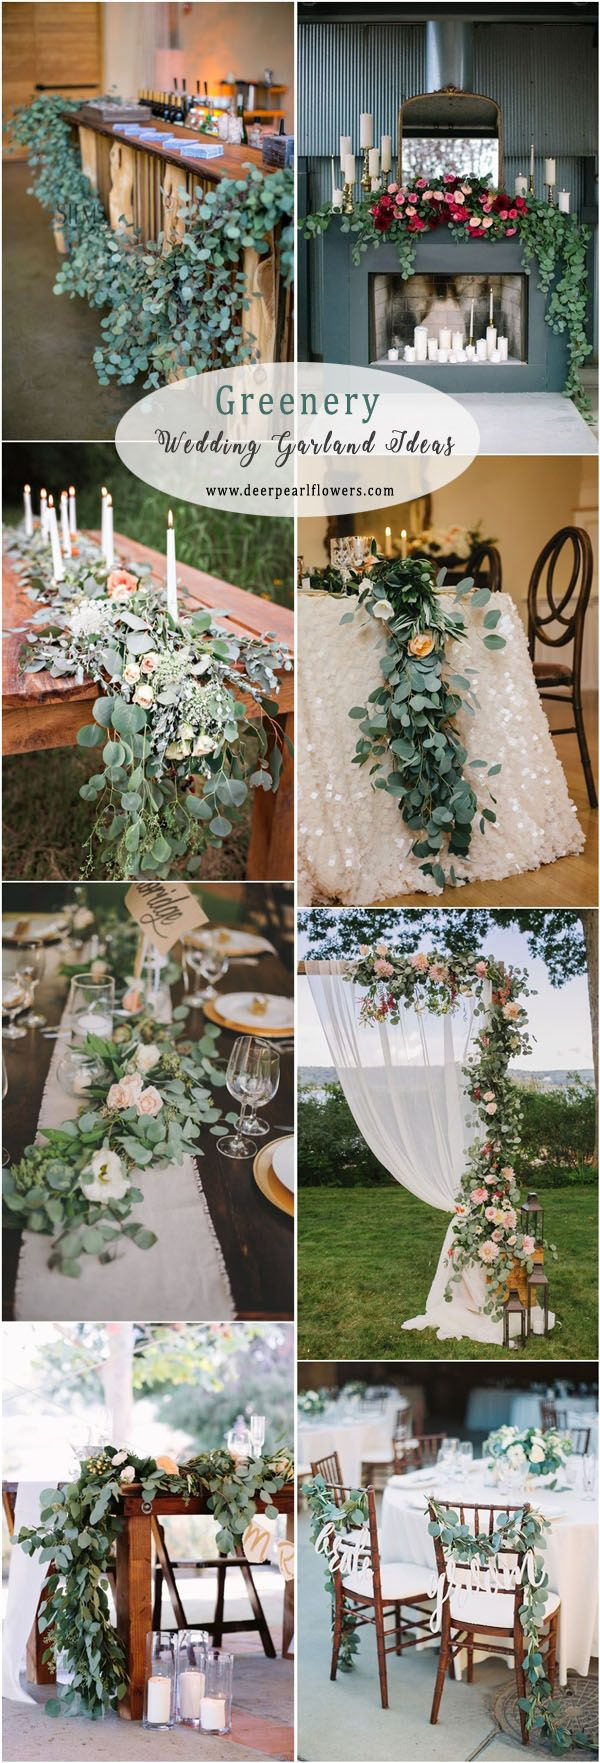 Greenery eucalyptus wedding garland ideas #green #wedding #weddingideas #dpf #deerpearlflowers / see more ❤️ http://www.deerpearlflowers.com/eucalyptus-wedding-decor-ideas/